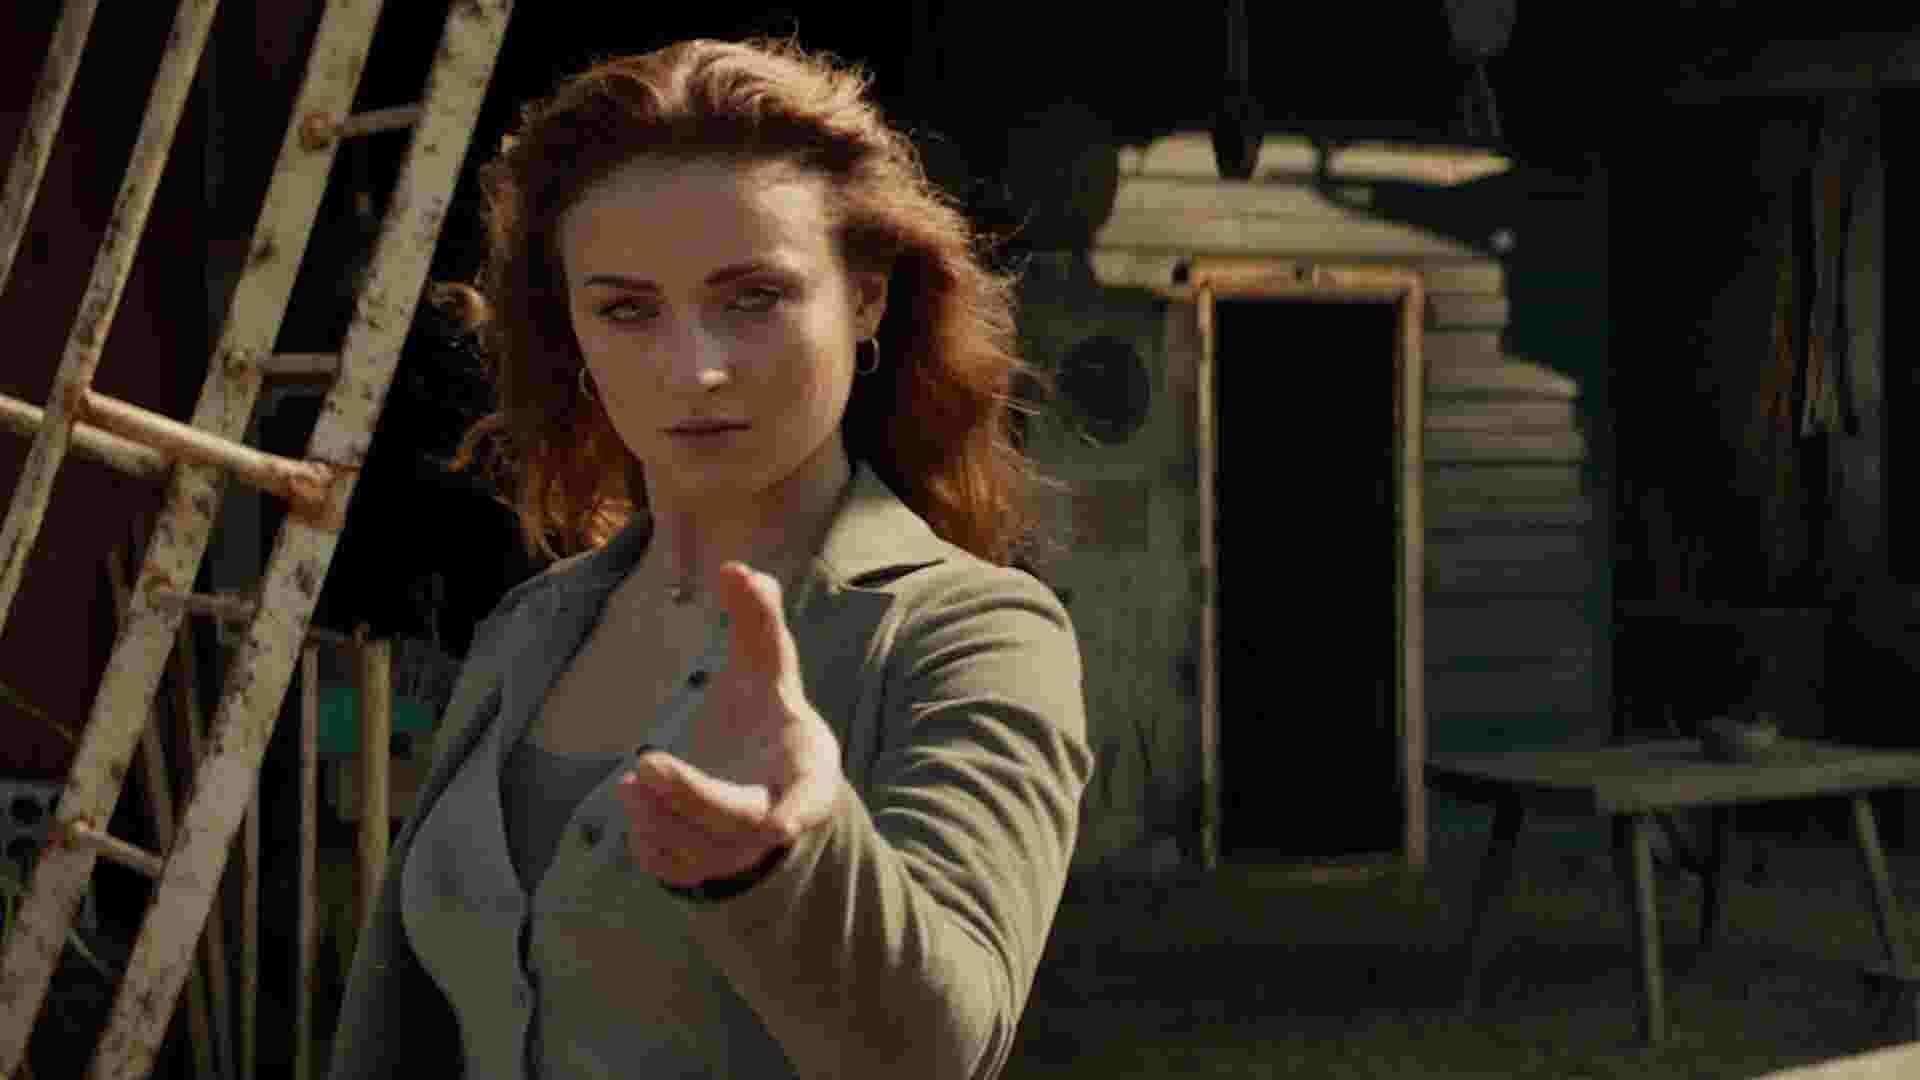 New 'Dark Phoenix' trailer shows 'evil' Jean Grey